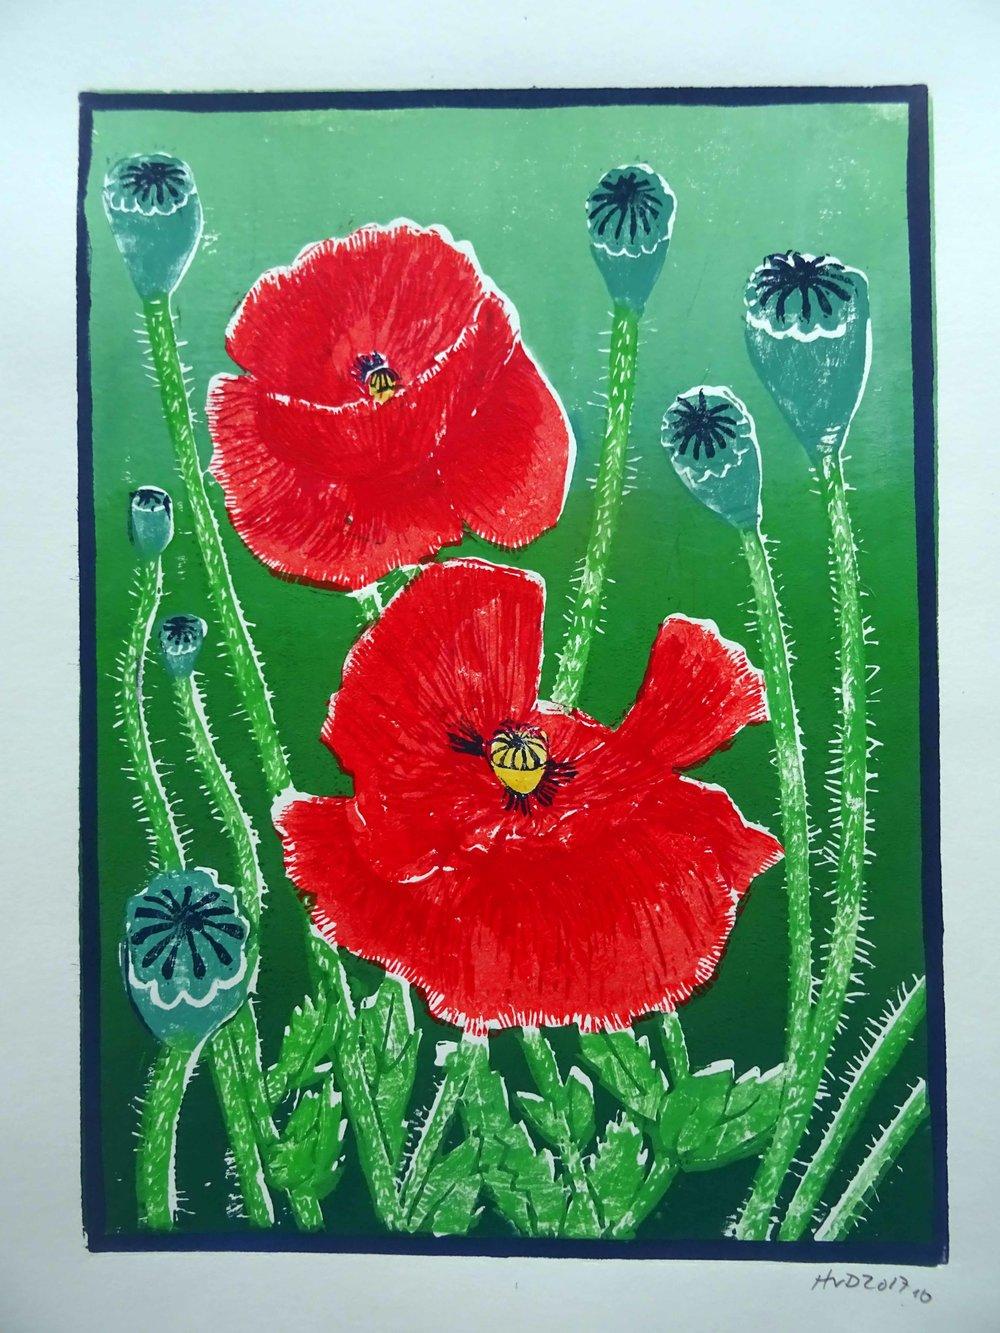 243 - Mohnblumen 3-plate lino 30x21 cm, 70 €